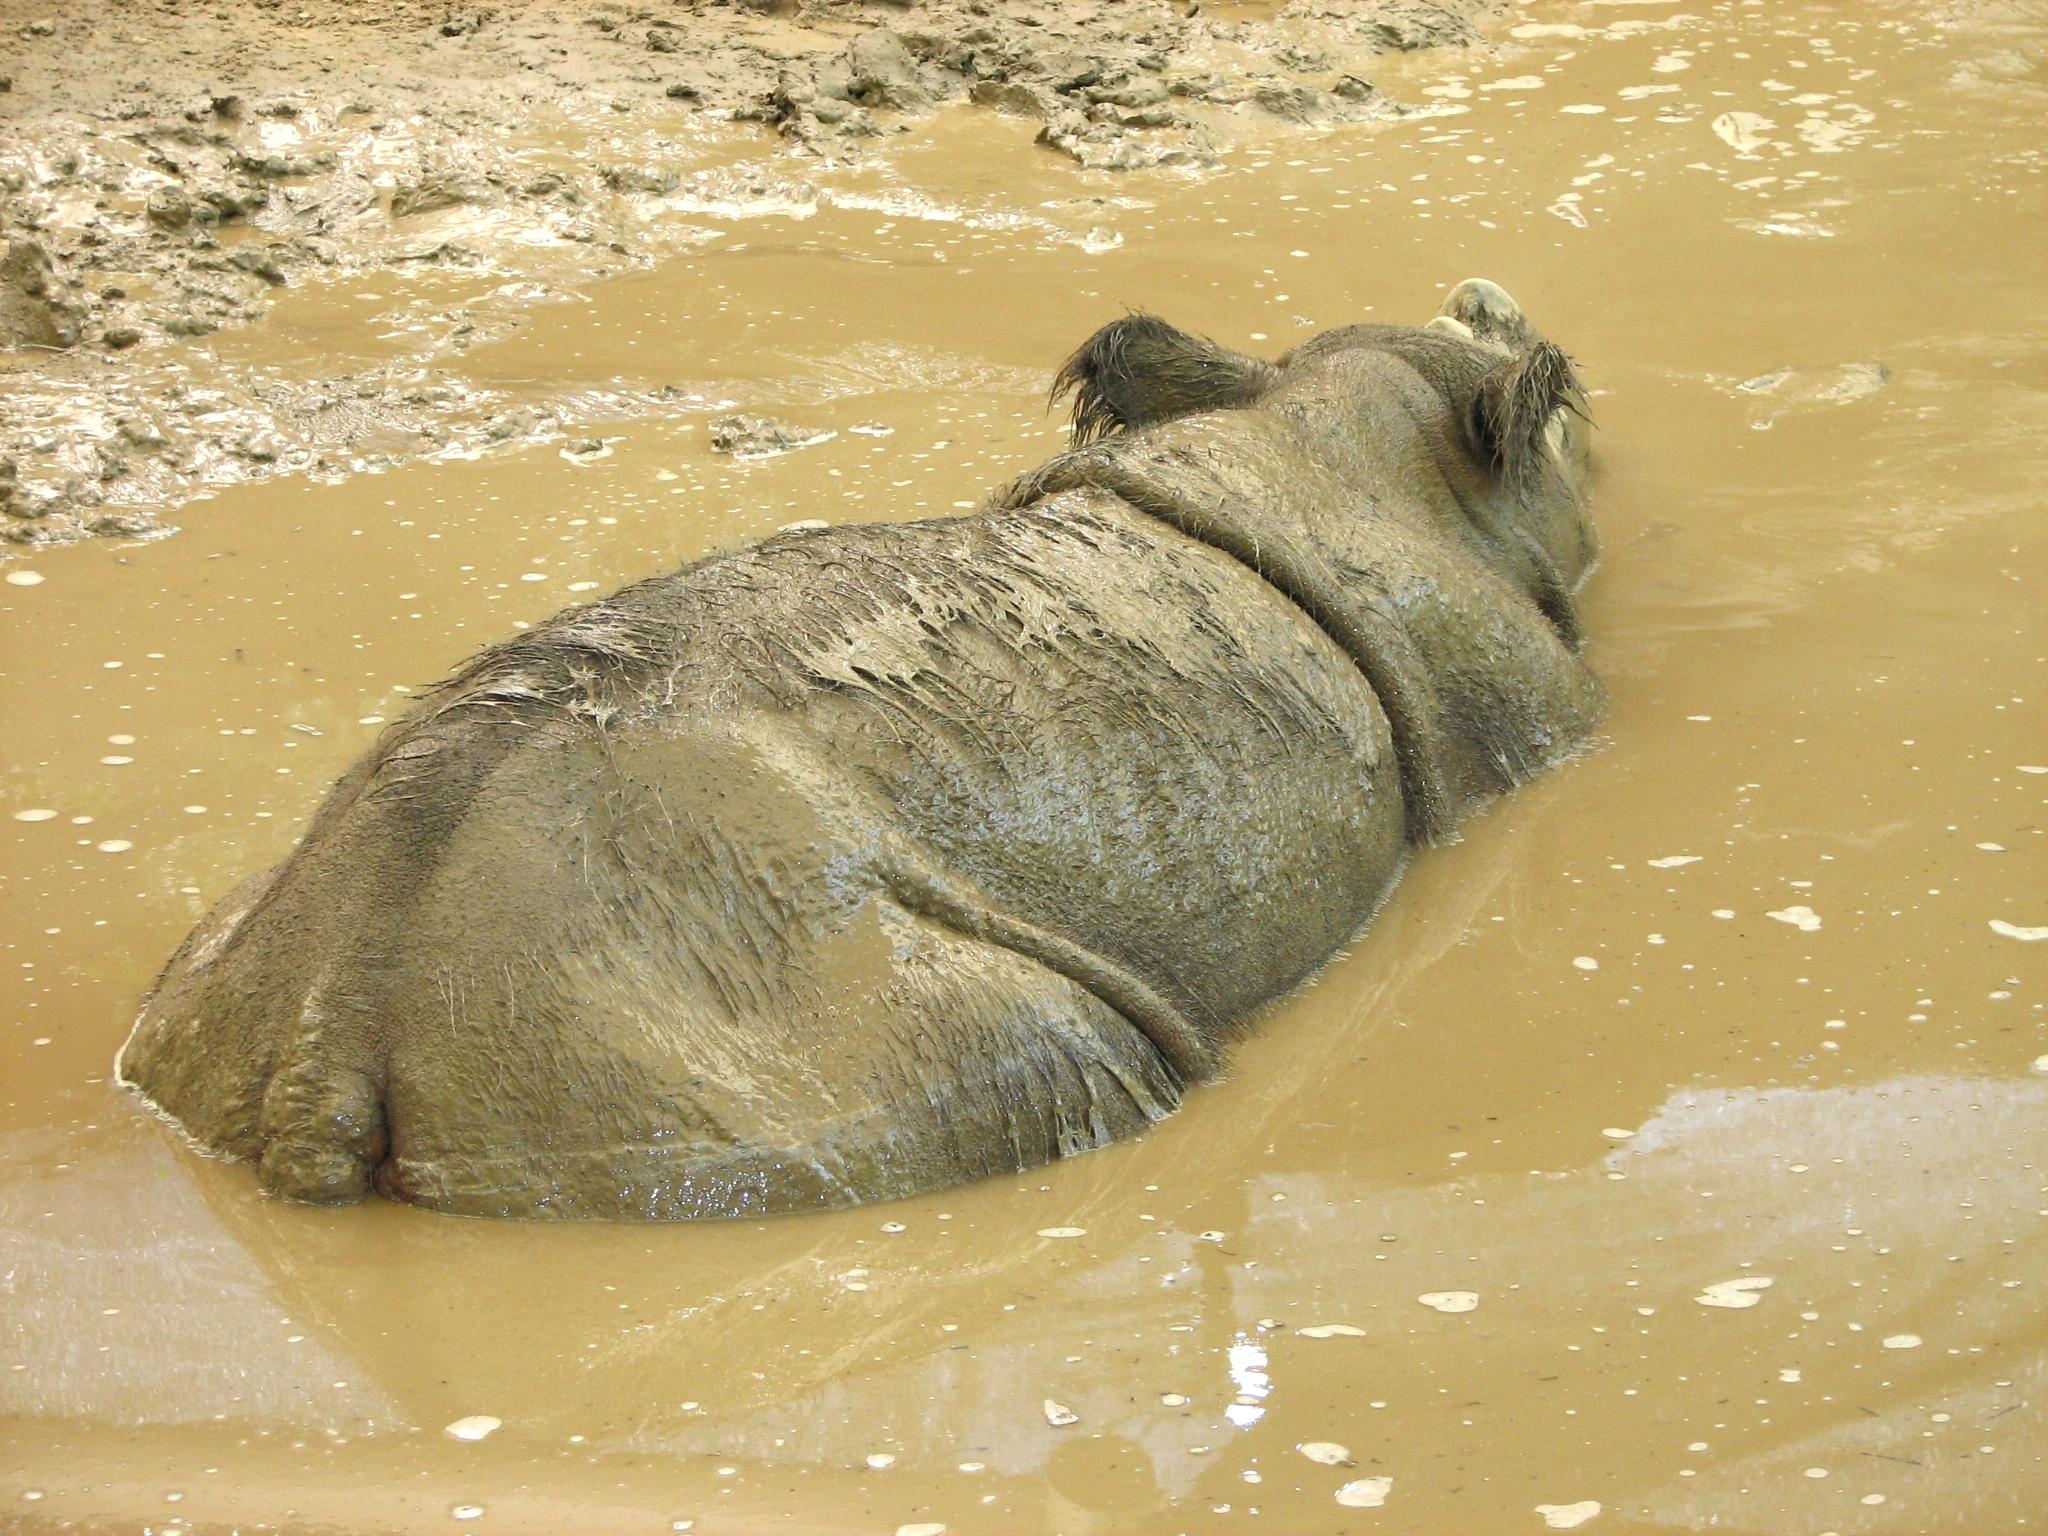 Rhino soaking in a muddy watering hole